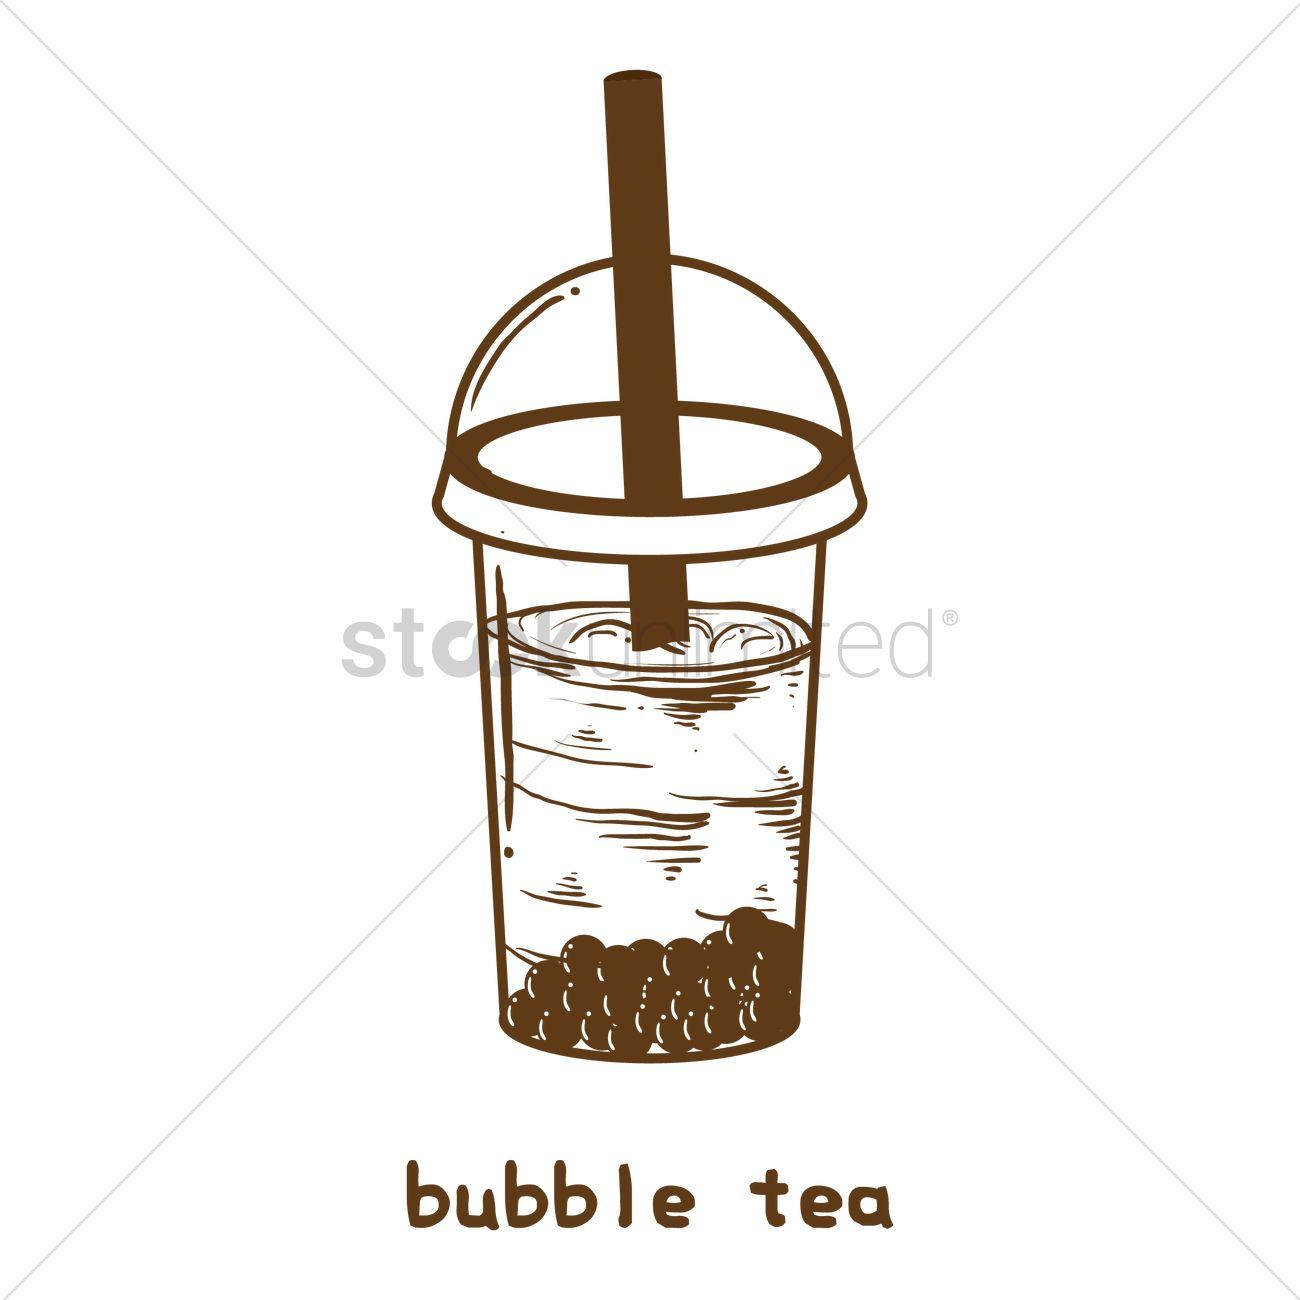 bubble tea vector image 2036037 stockunlimited bubble tea vector image 2036037